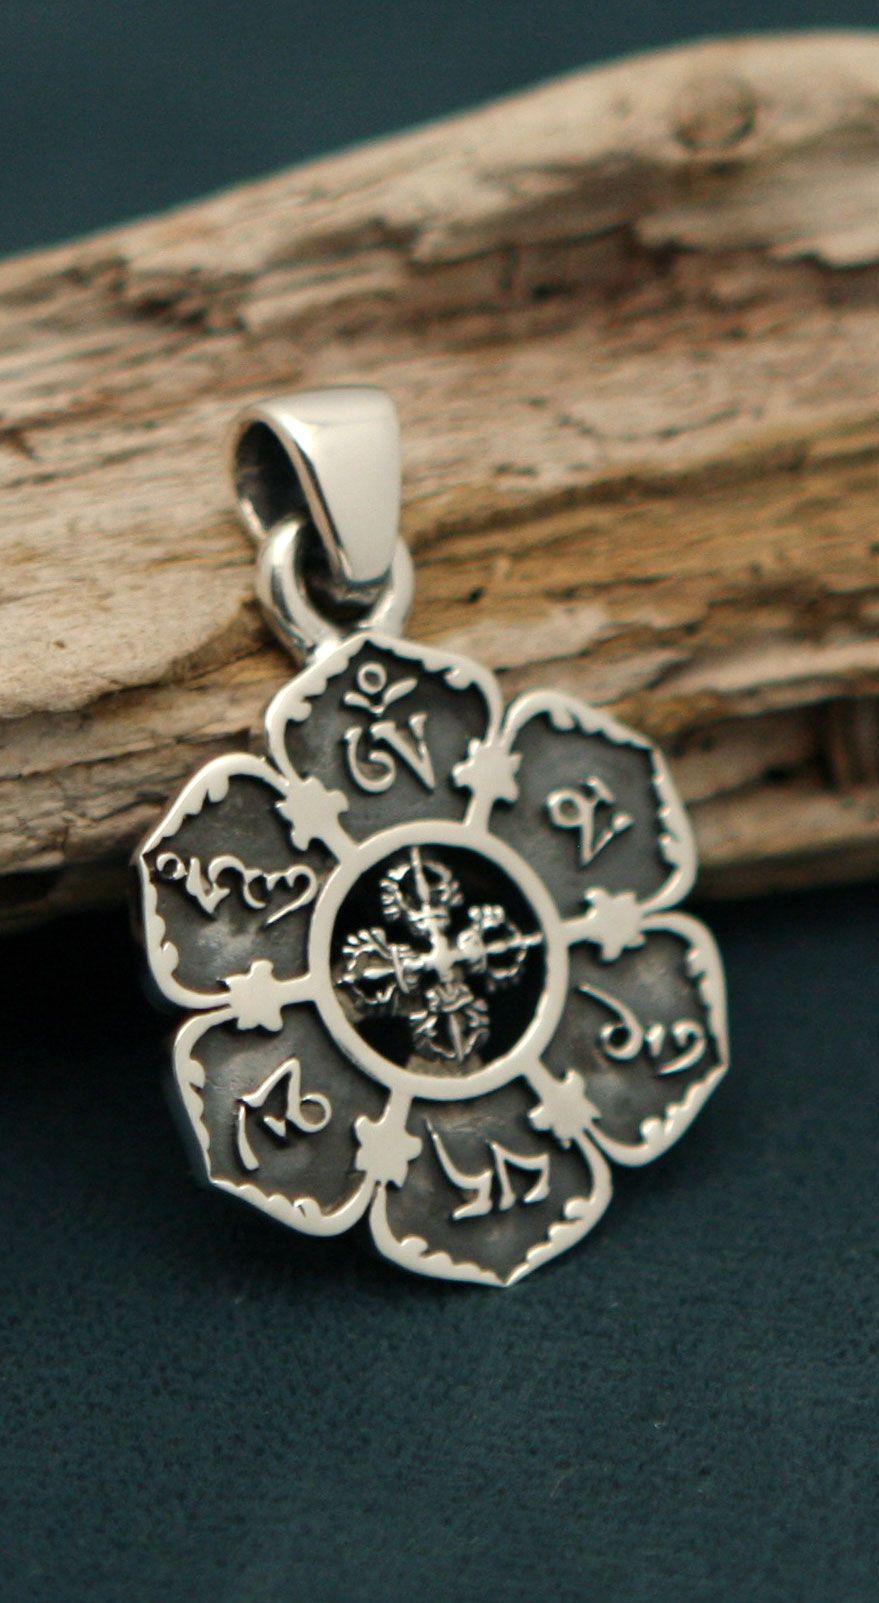 20 Silver Tibetan Metal Charms,OHM Pendant Necklace Jewellery making,yoga